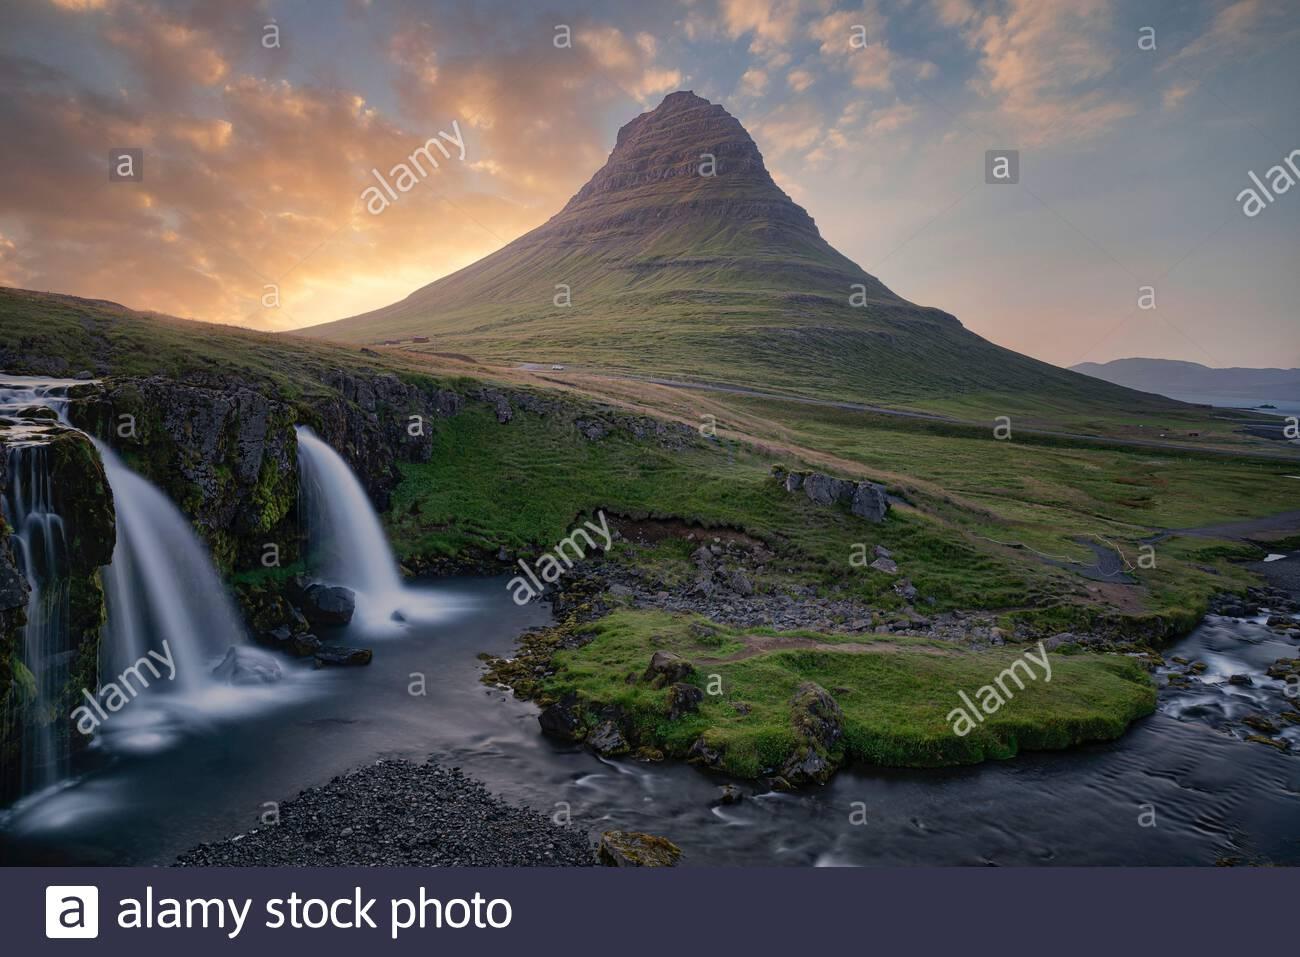 iceland-kirkjufell-mountain-and-kirkjufe